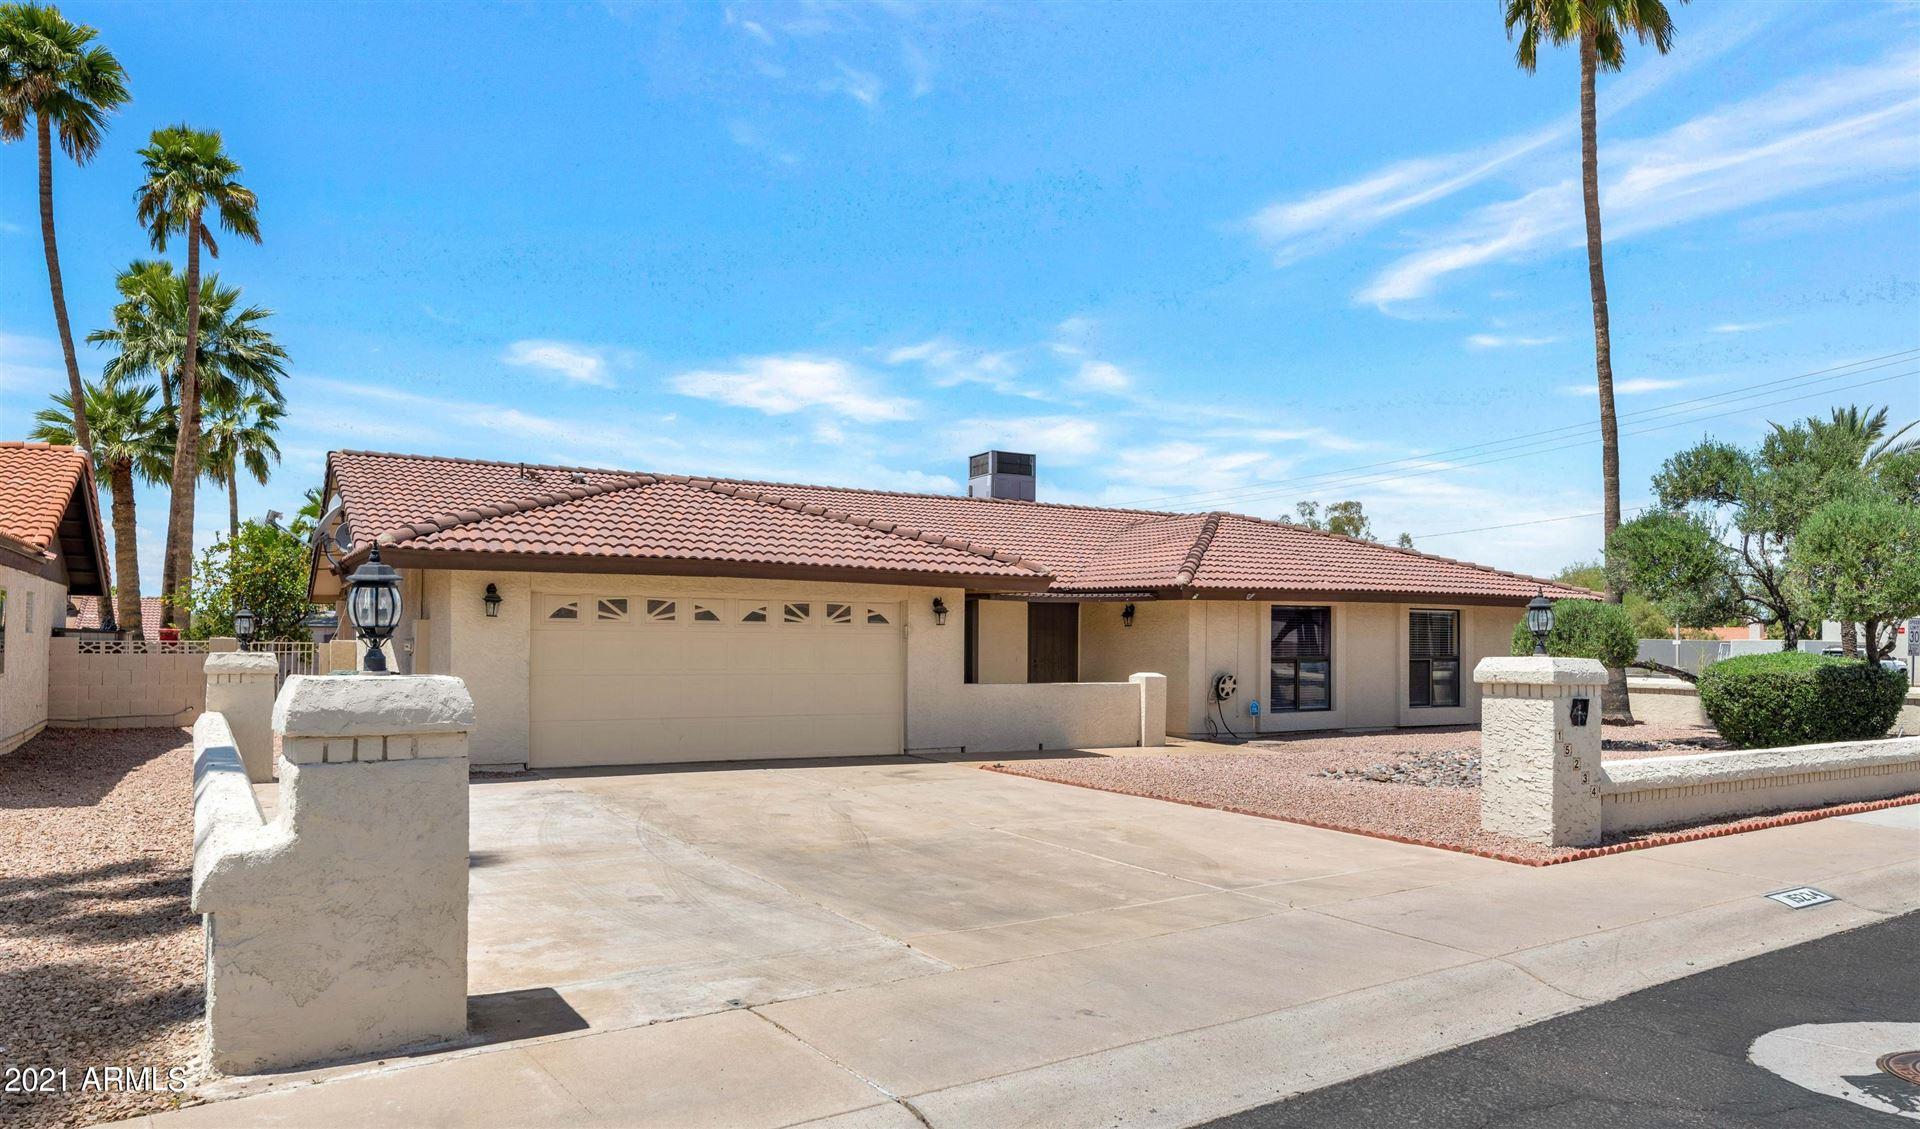 15234 N 6TH Street, Phoenix, AZ 85022 - MLS#: 6229213